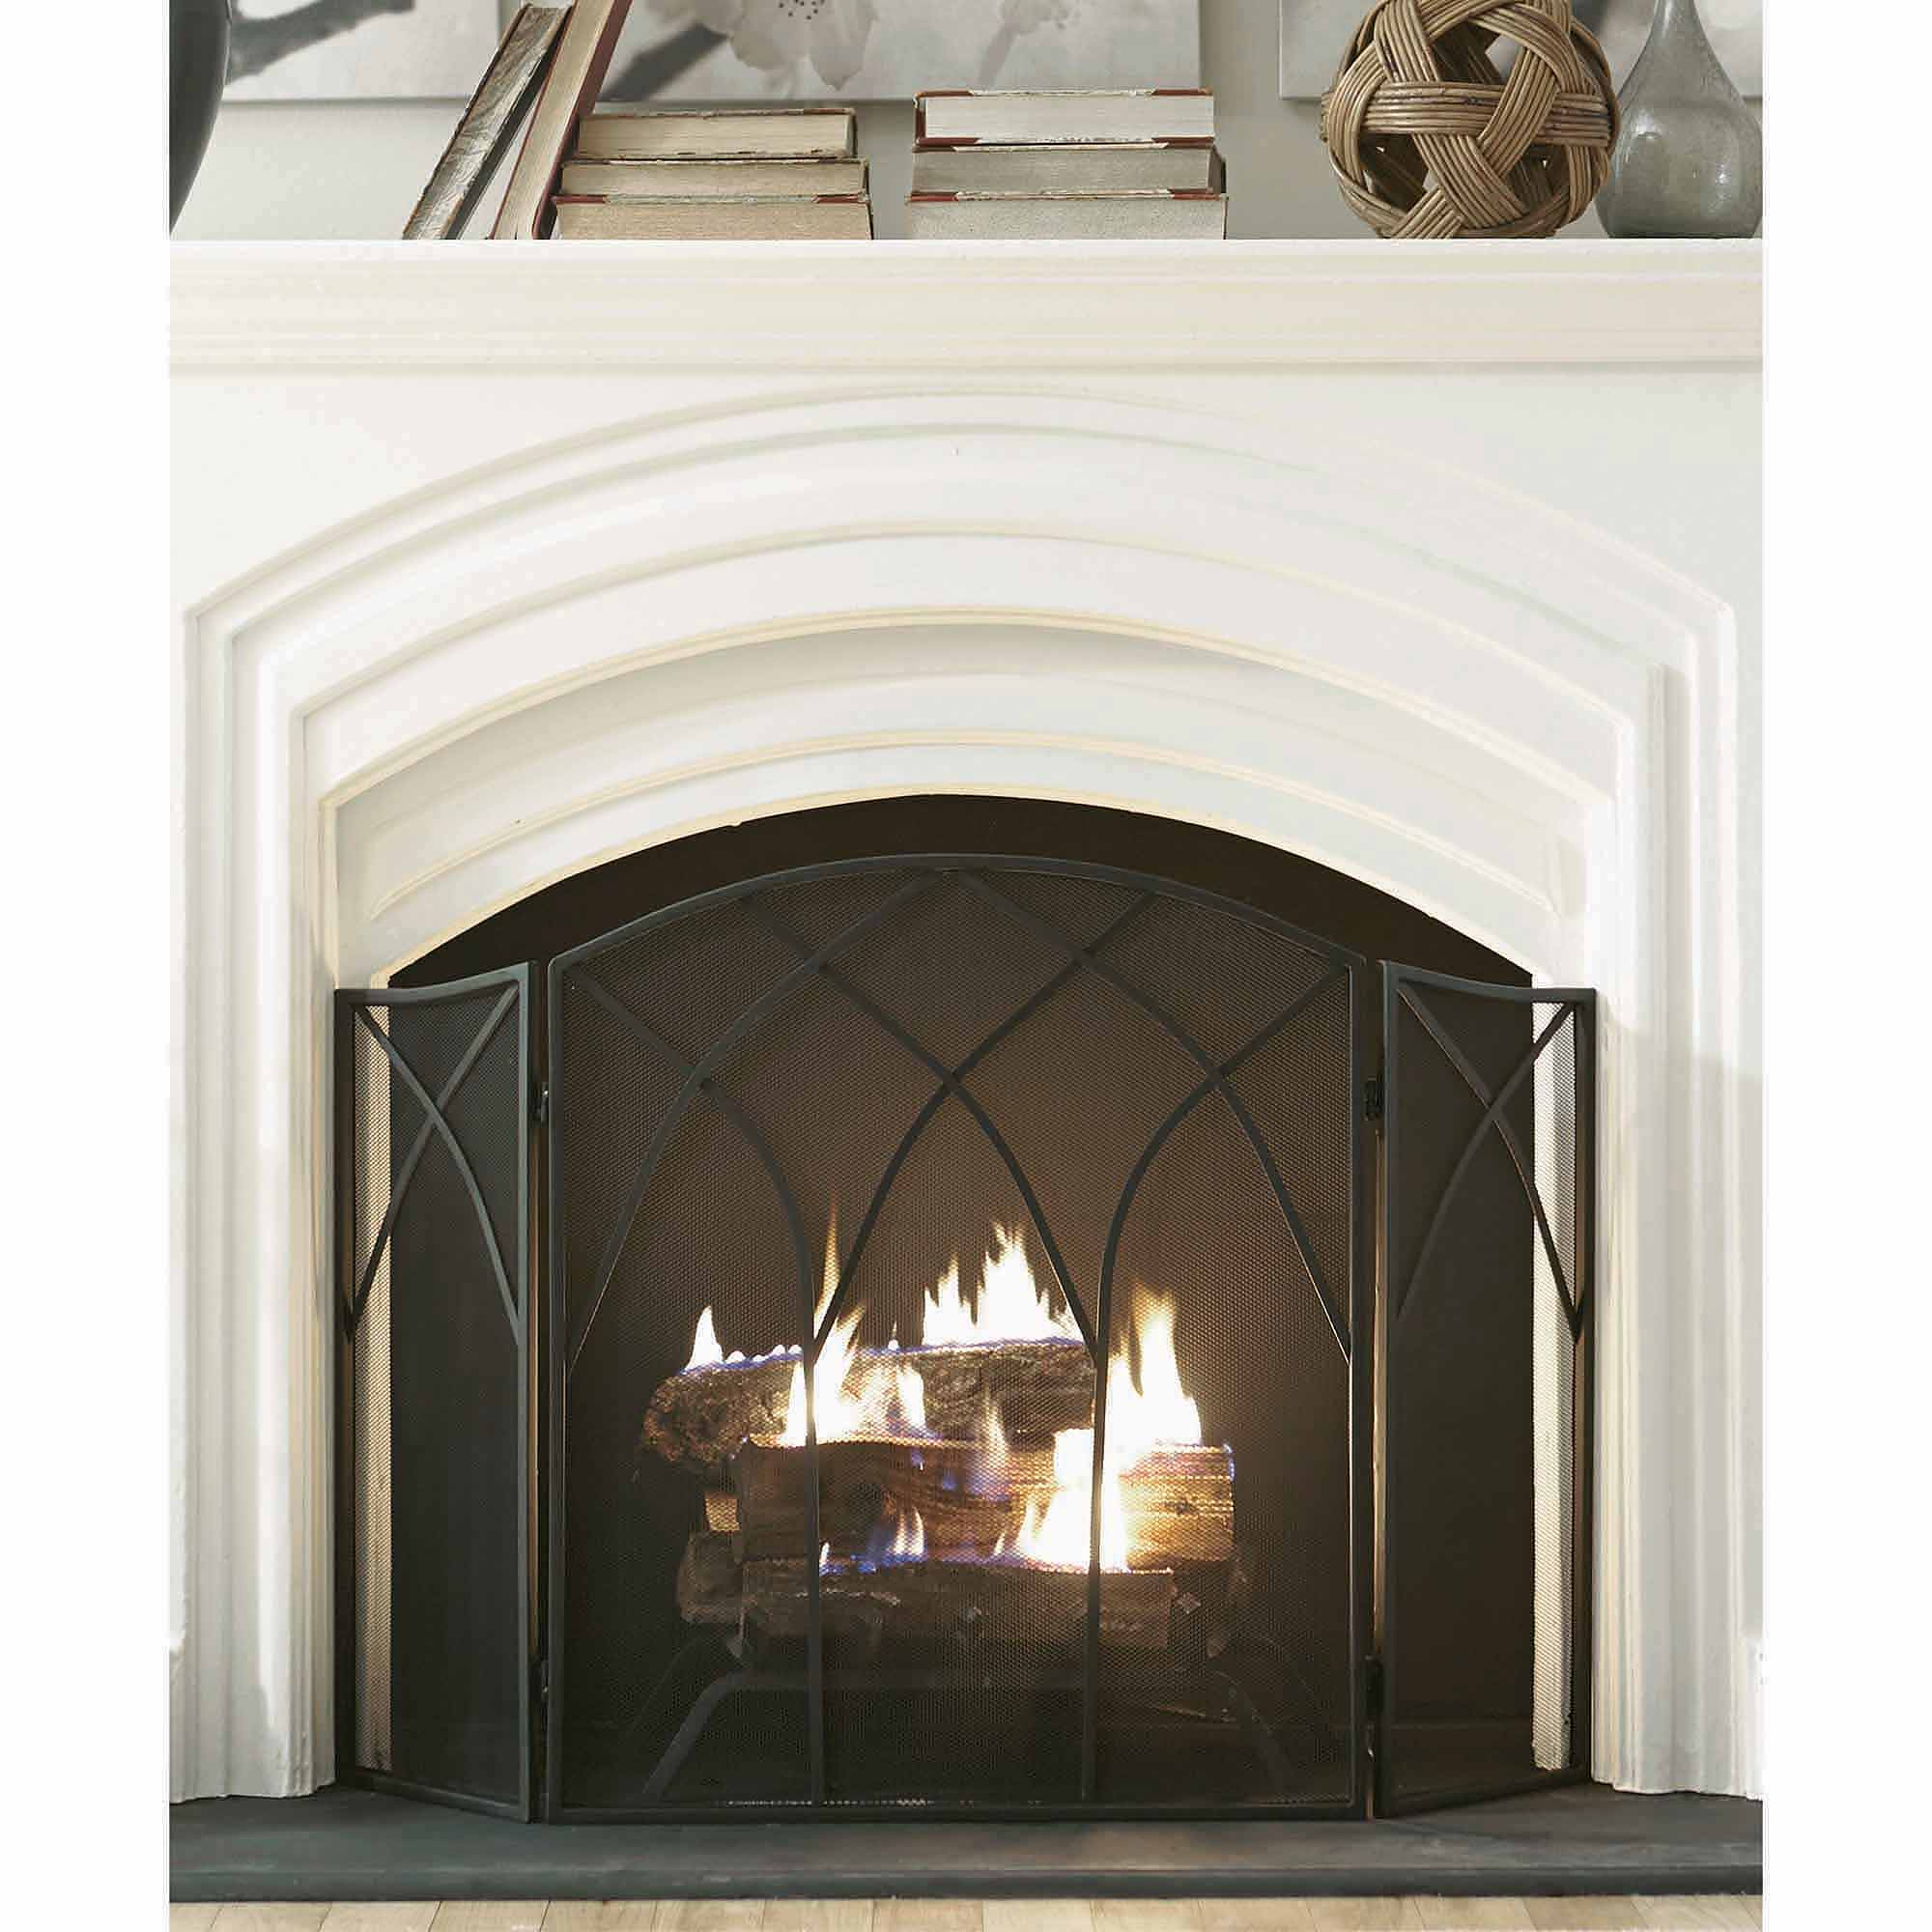 walmart kitchen decor island made out of dresser pleasant hearth gothic fireplace screen, black - walmart.com